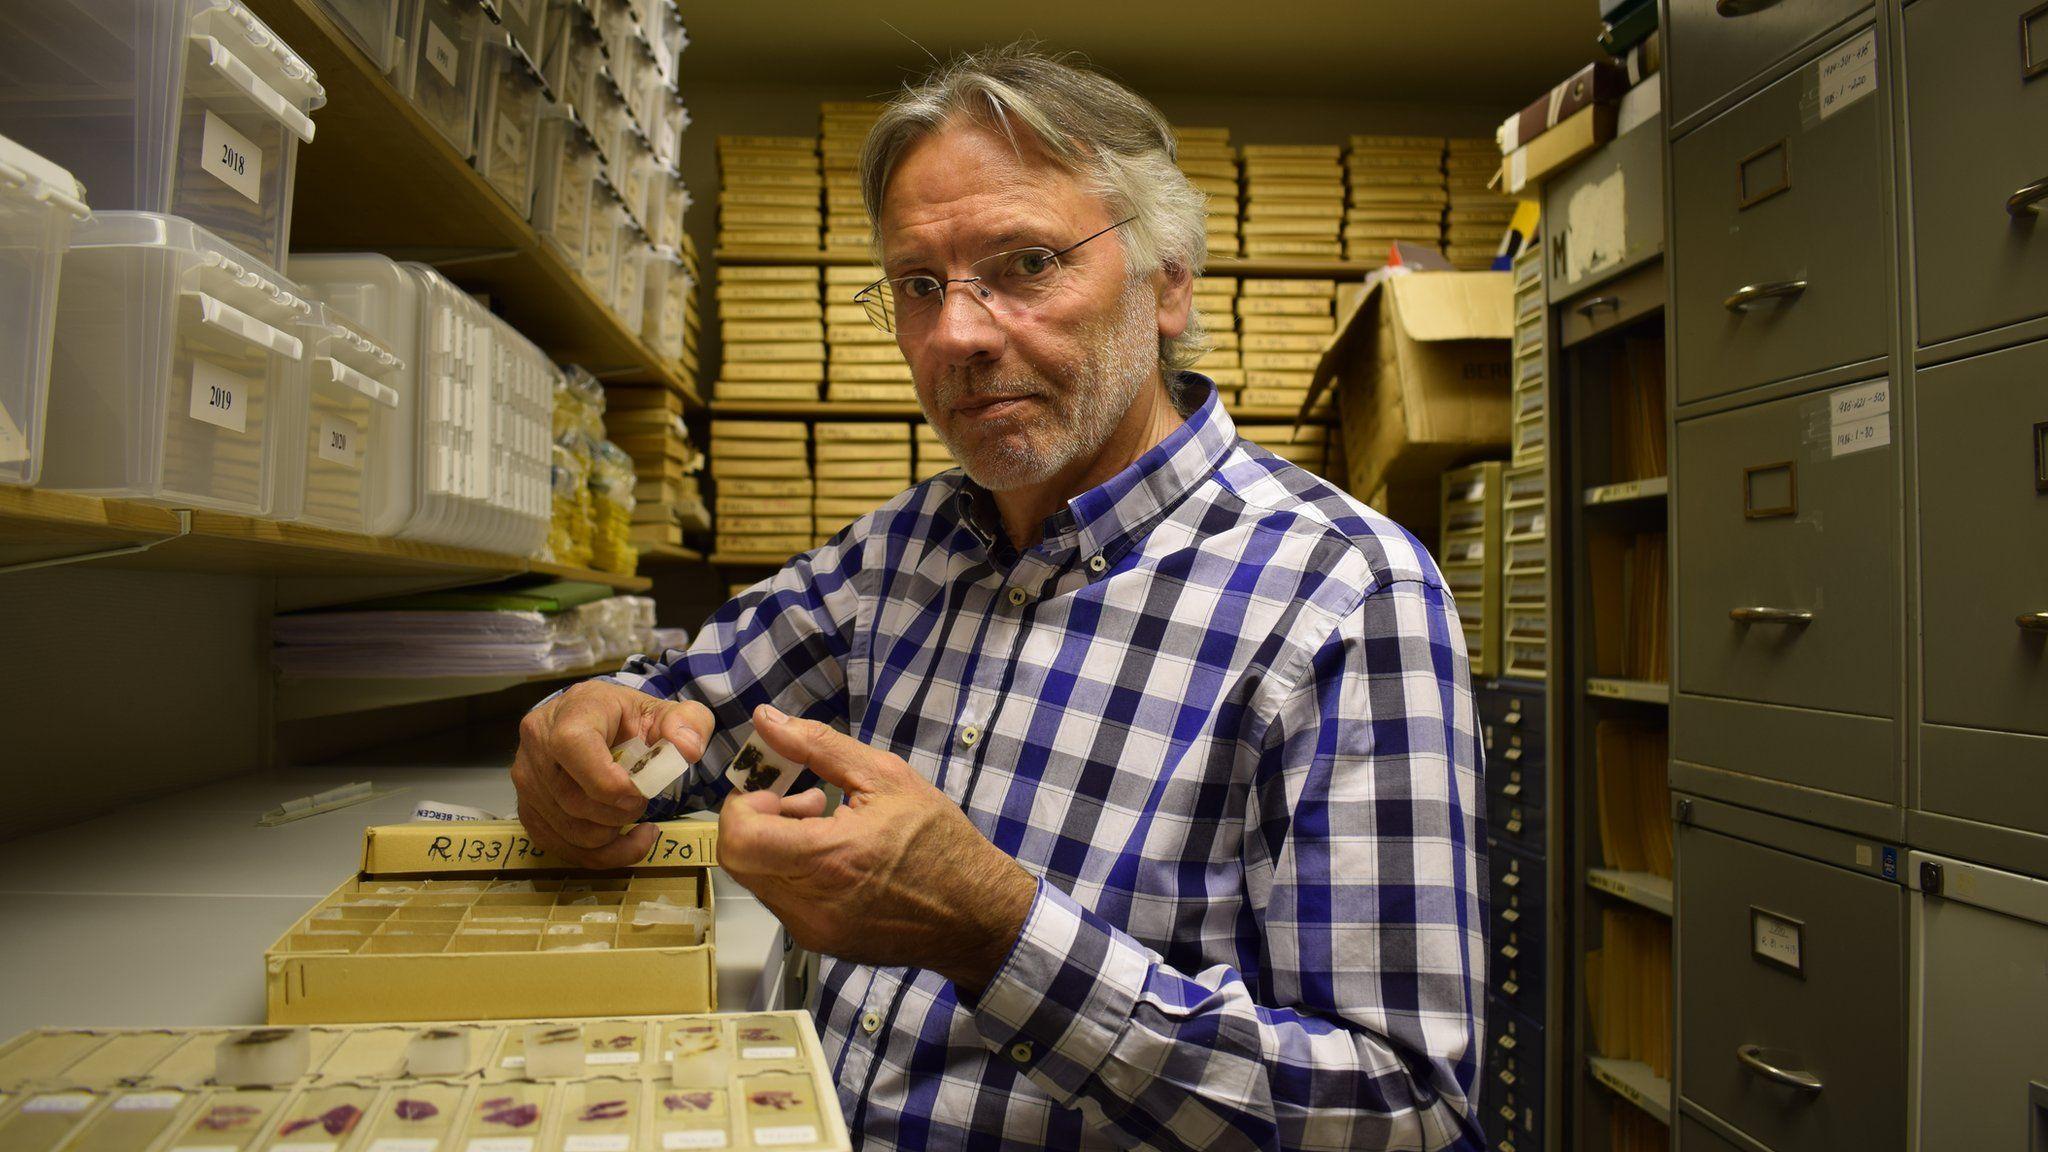 Prof Inge Morild looks through tissue samples belonging to the Isdal Woman